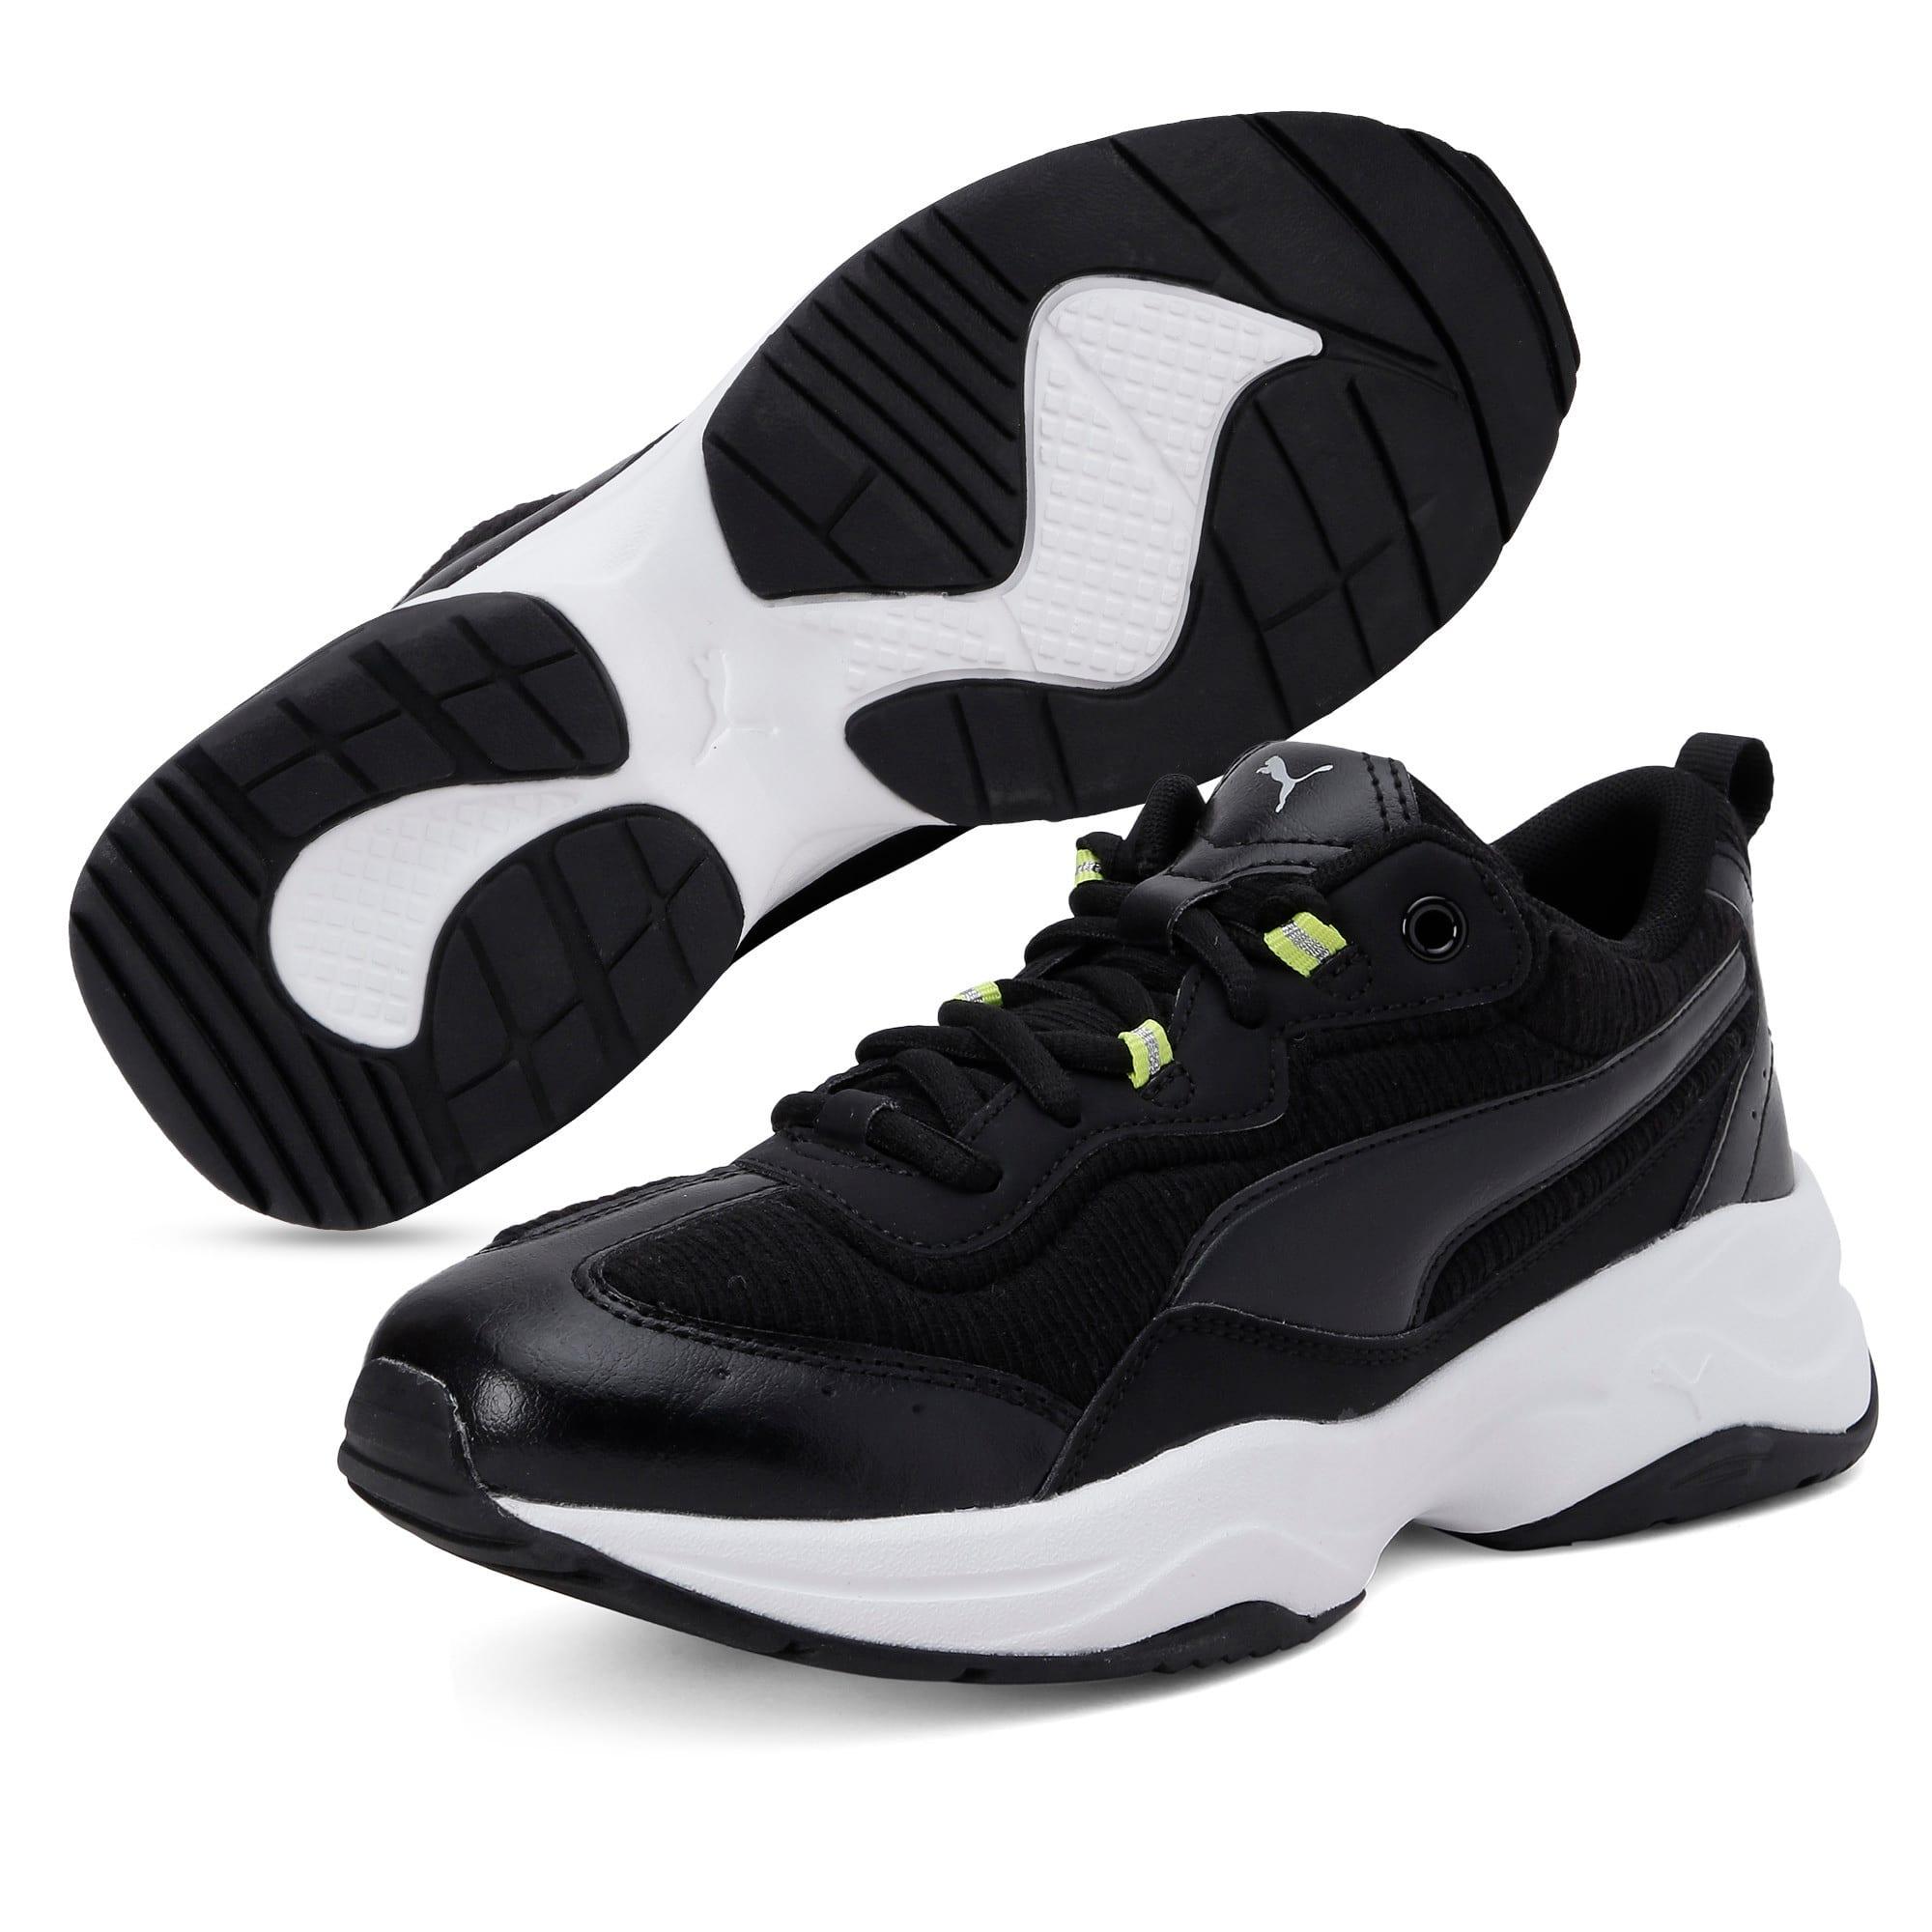 Thumbnail 4 of Cilia Shift Women's Training Shoes, Black-Nrgy Yellow-Silver-Wht, medium-IND